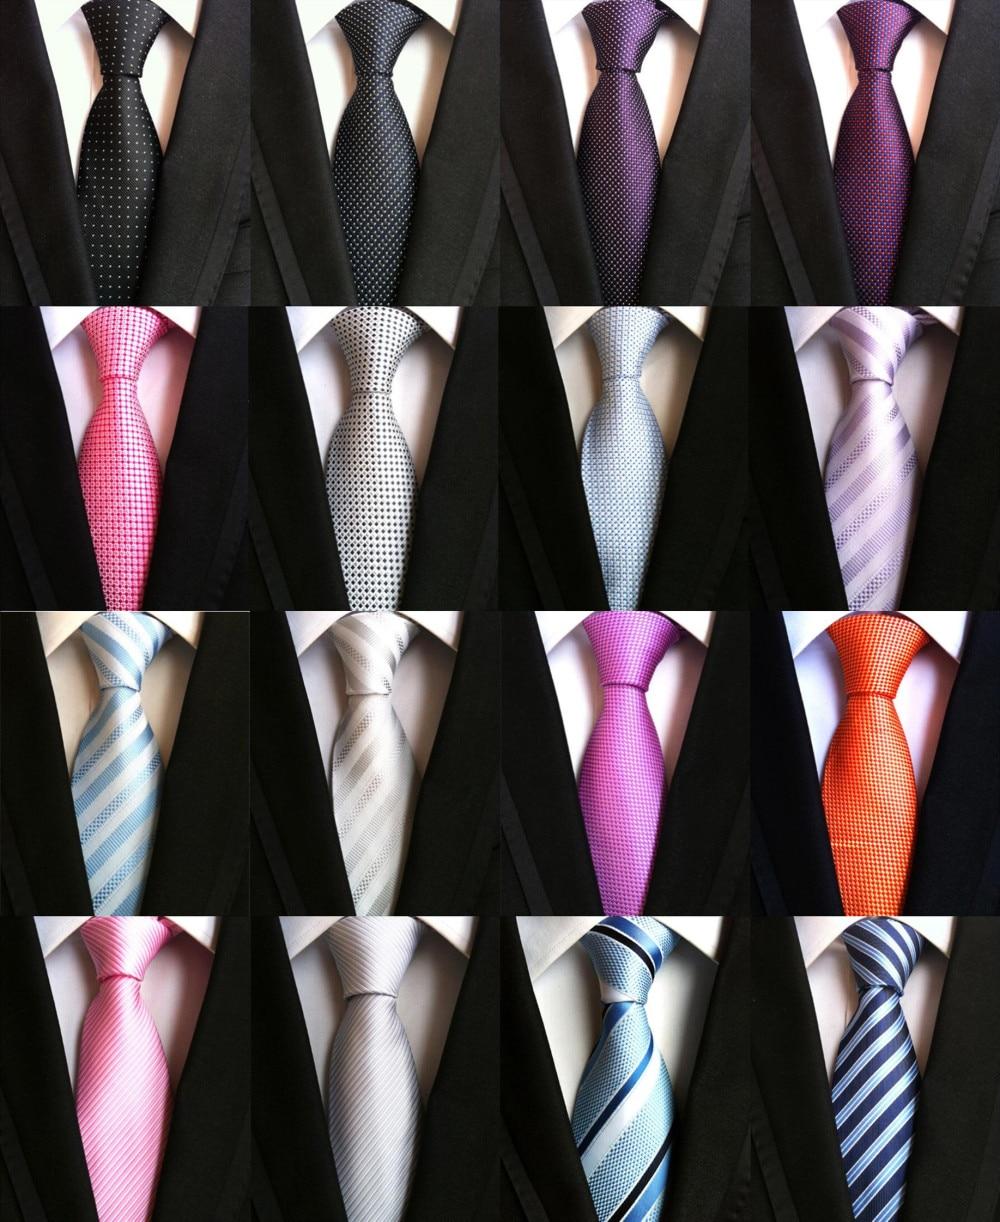 8CM Fashion Classic Men's Stripe Tie Purple White Blue Black Pink Lavender Jacquard Woven 100% Silk Tie Necktie Polka Dots Ties